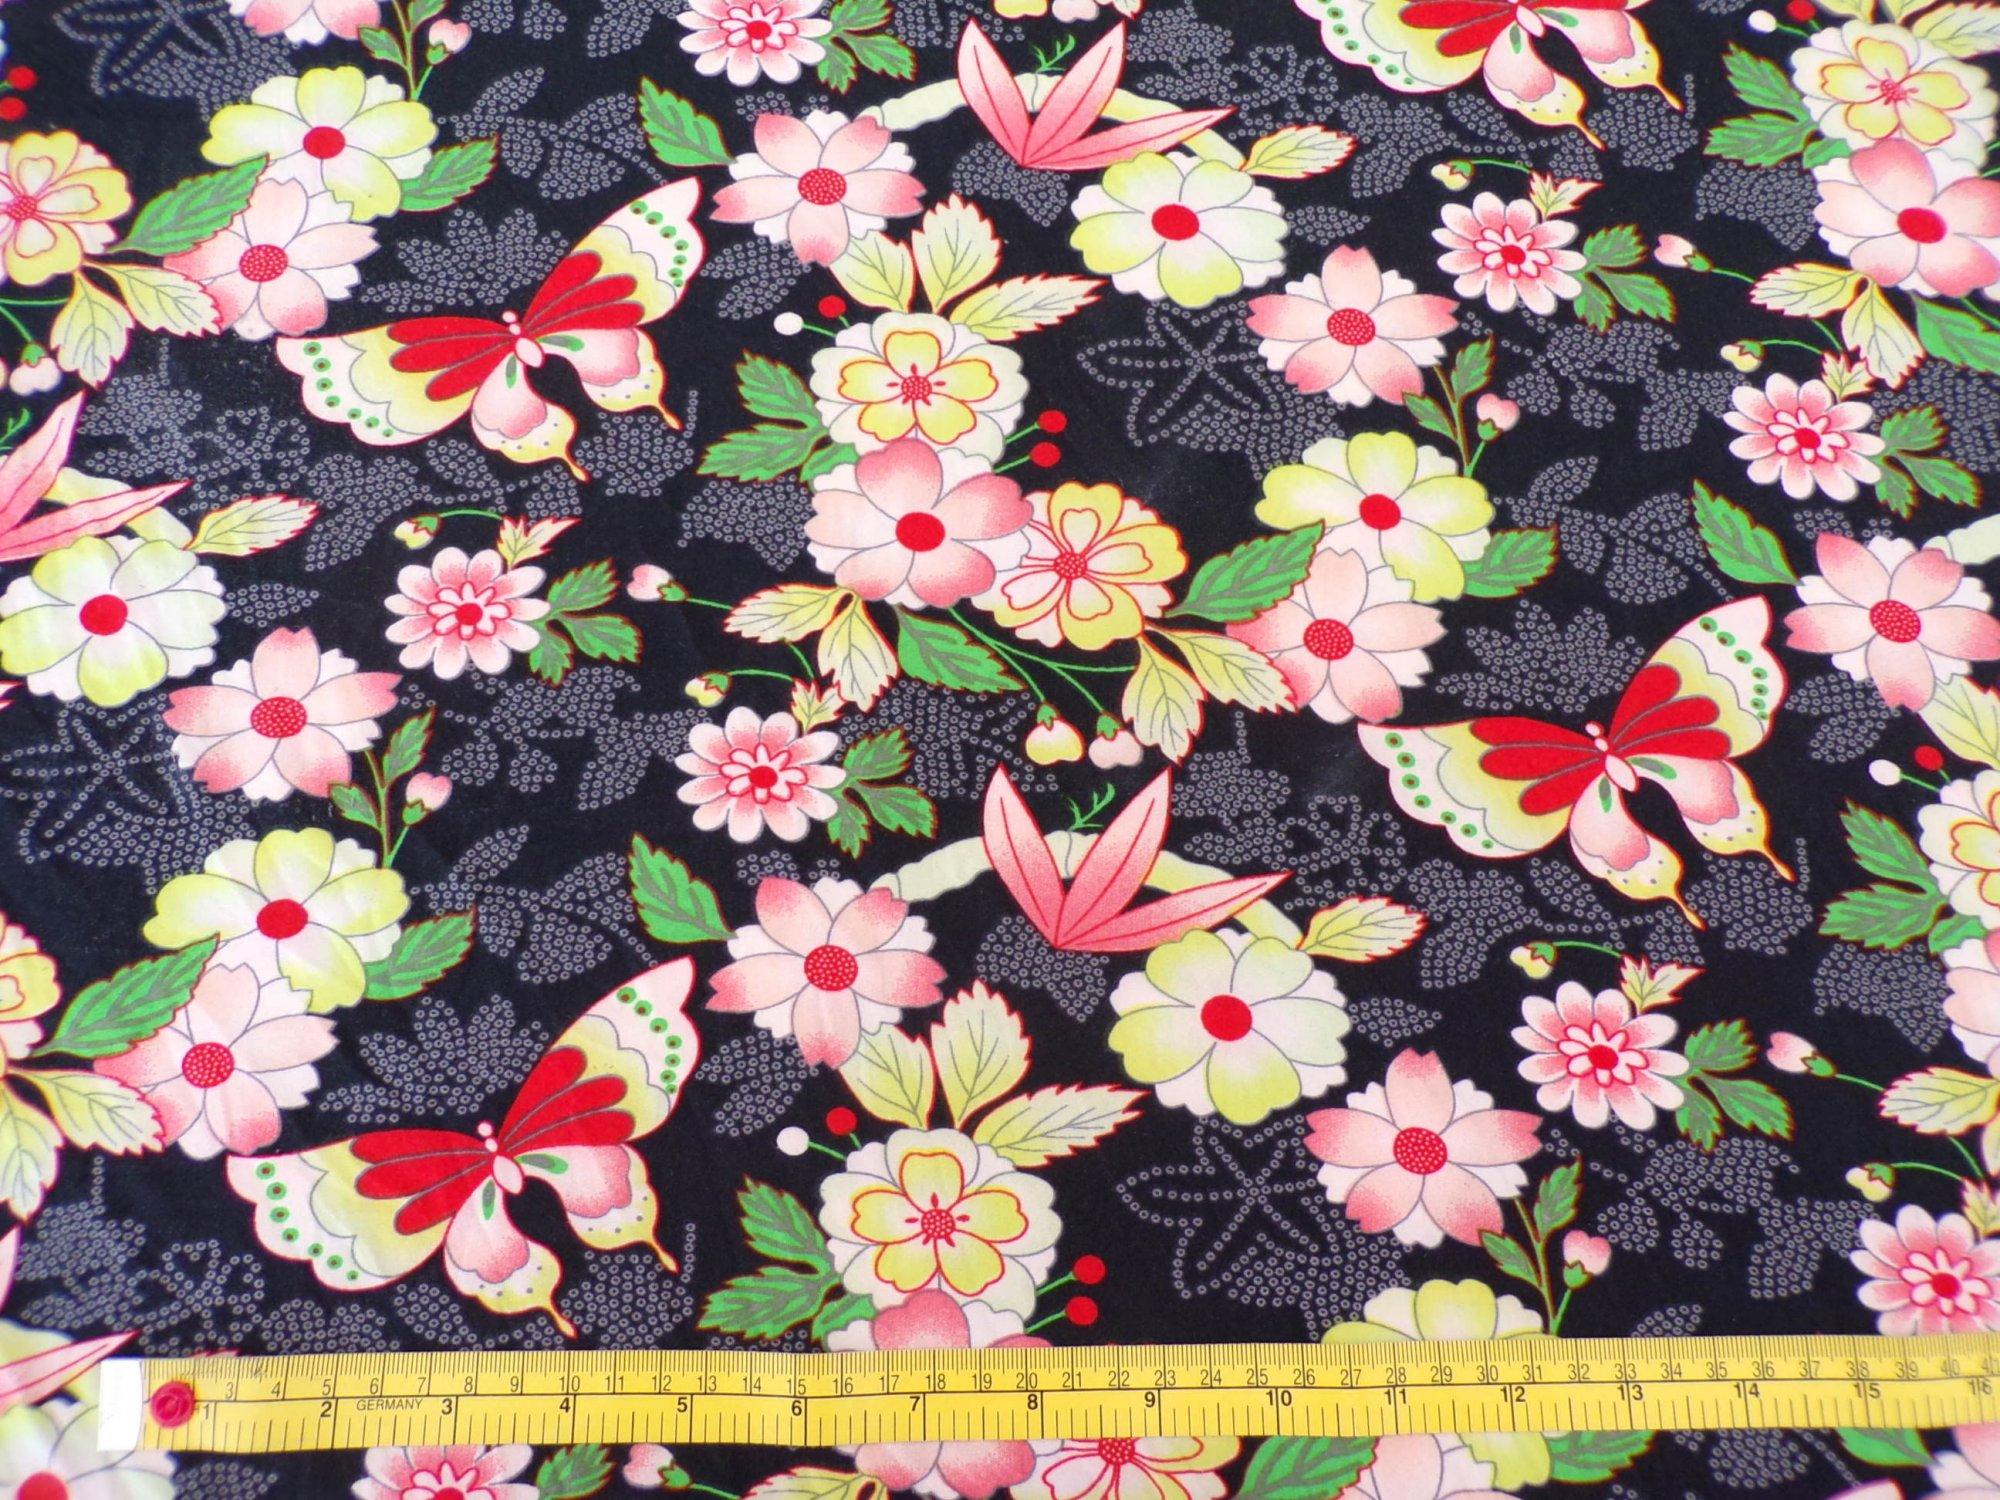 Milana (DBP) - Black Floral Blossoming Garden